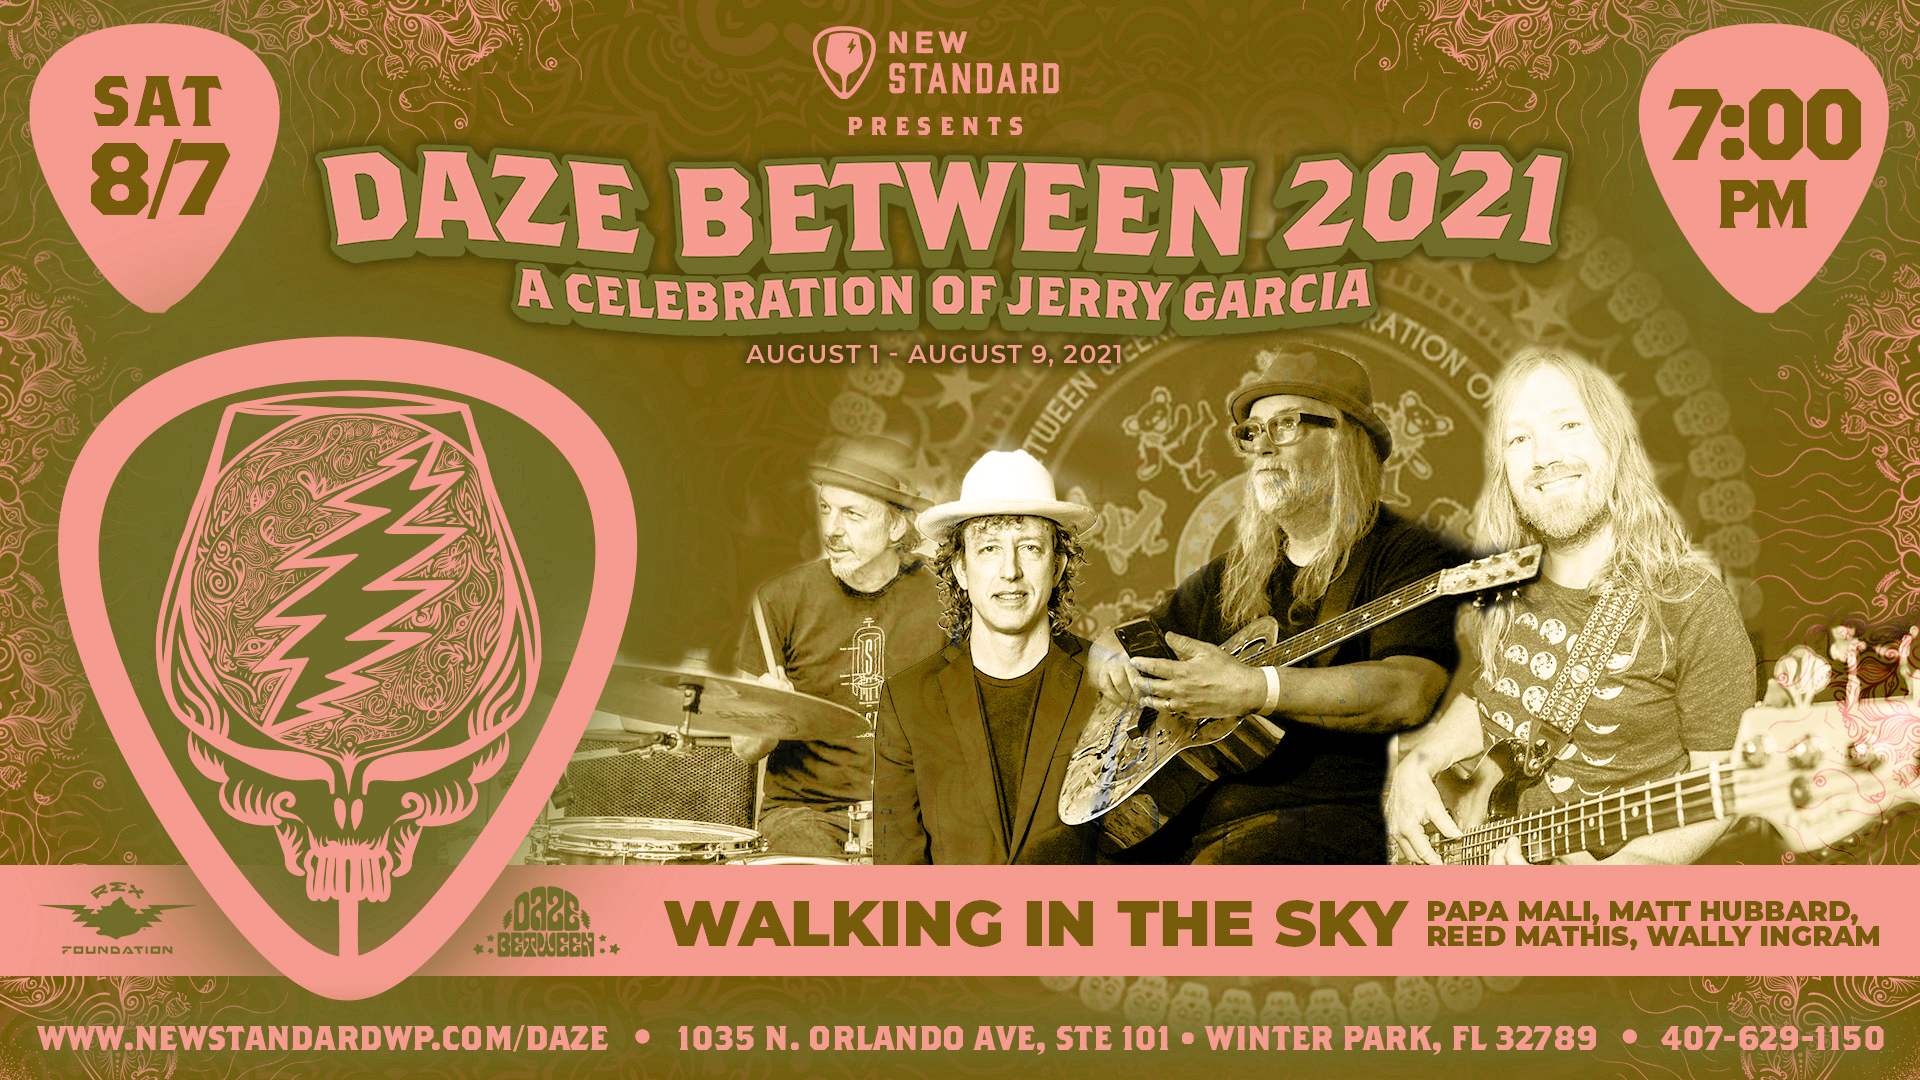 Photo for Walking In The Sky - Papa Mali, Matt Hubbard, Reed Mathis, & Wally Ingram - Daze Between 2021 - 8/7 on ViewStub